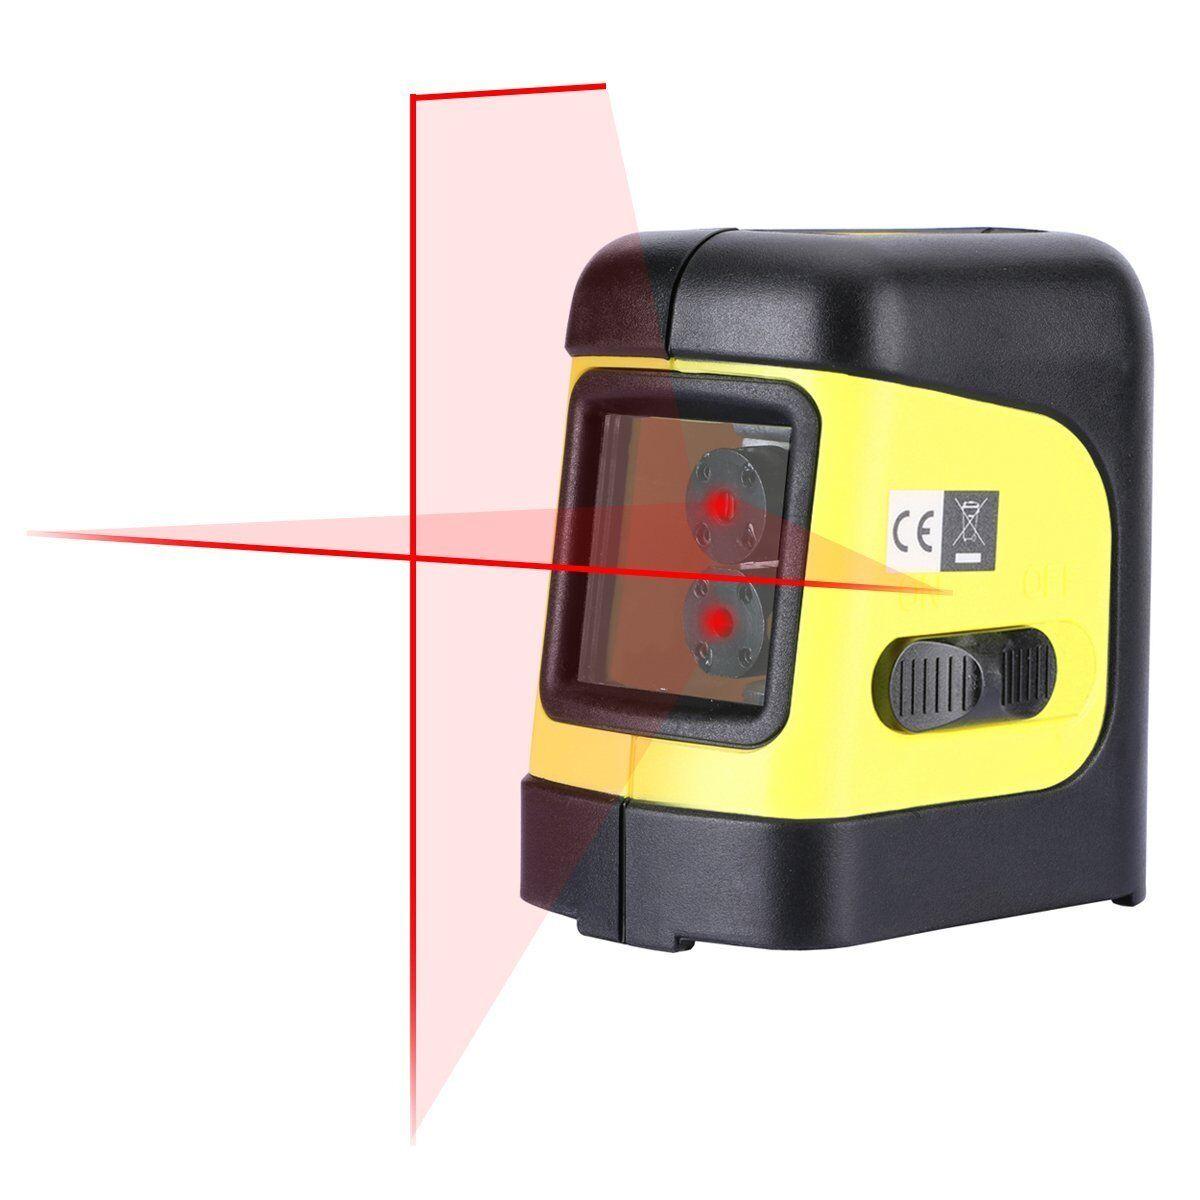 Firecore Self-Leveling Horizontal/Vertical Cross-Line Laser